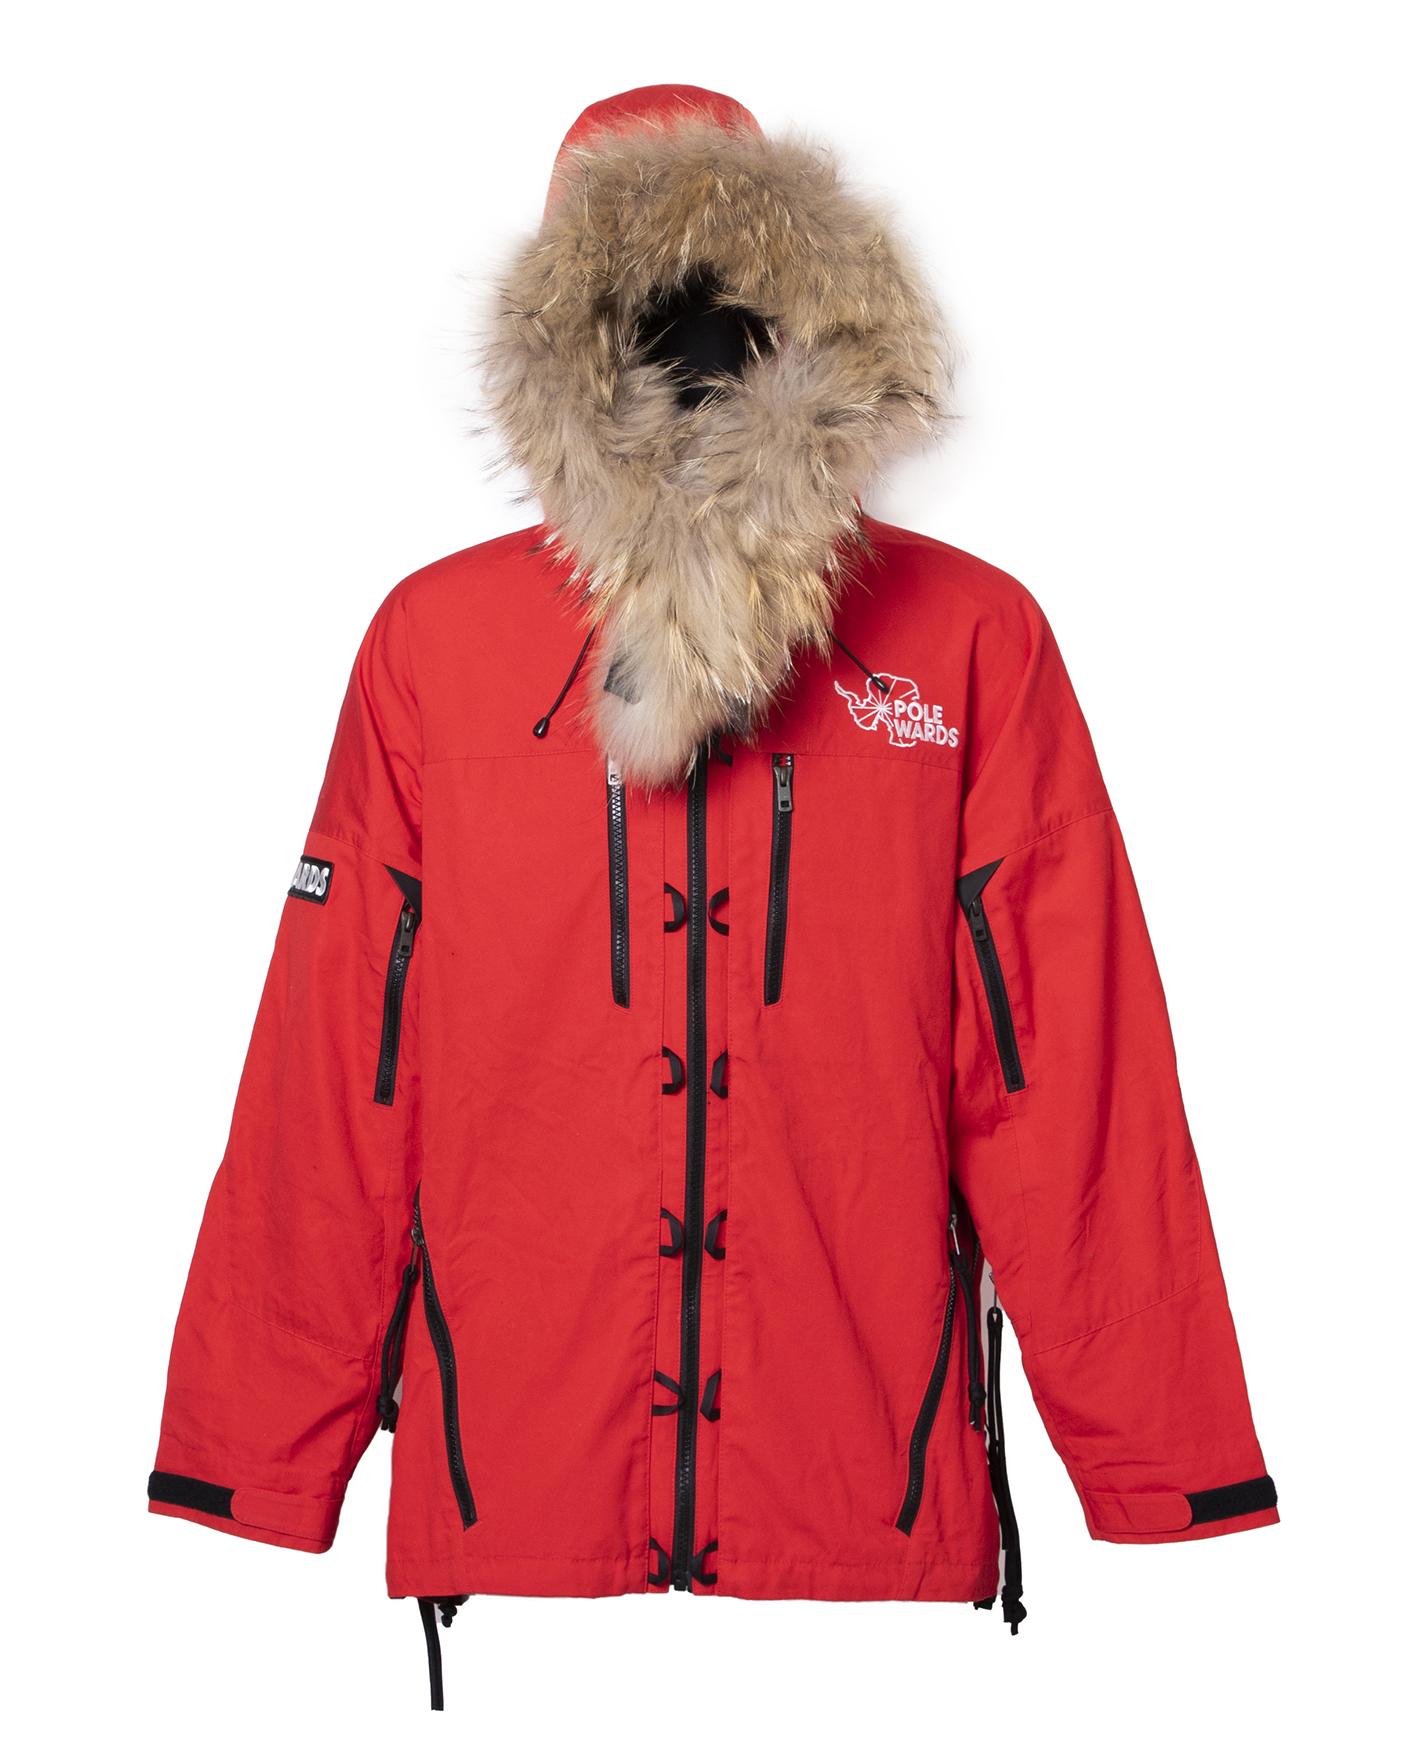 Ogita Adventure Walk Jacket(オギタ アドベンチャーウォーク ジャケット)